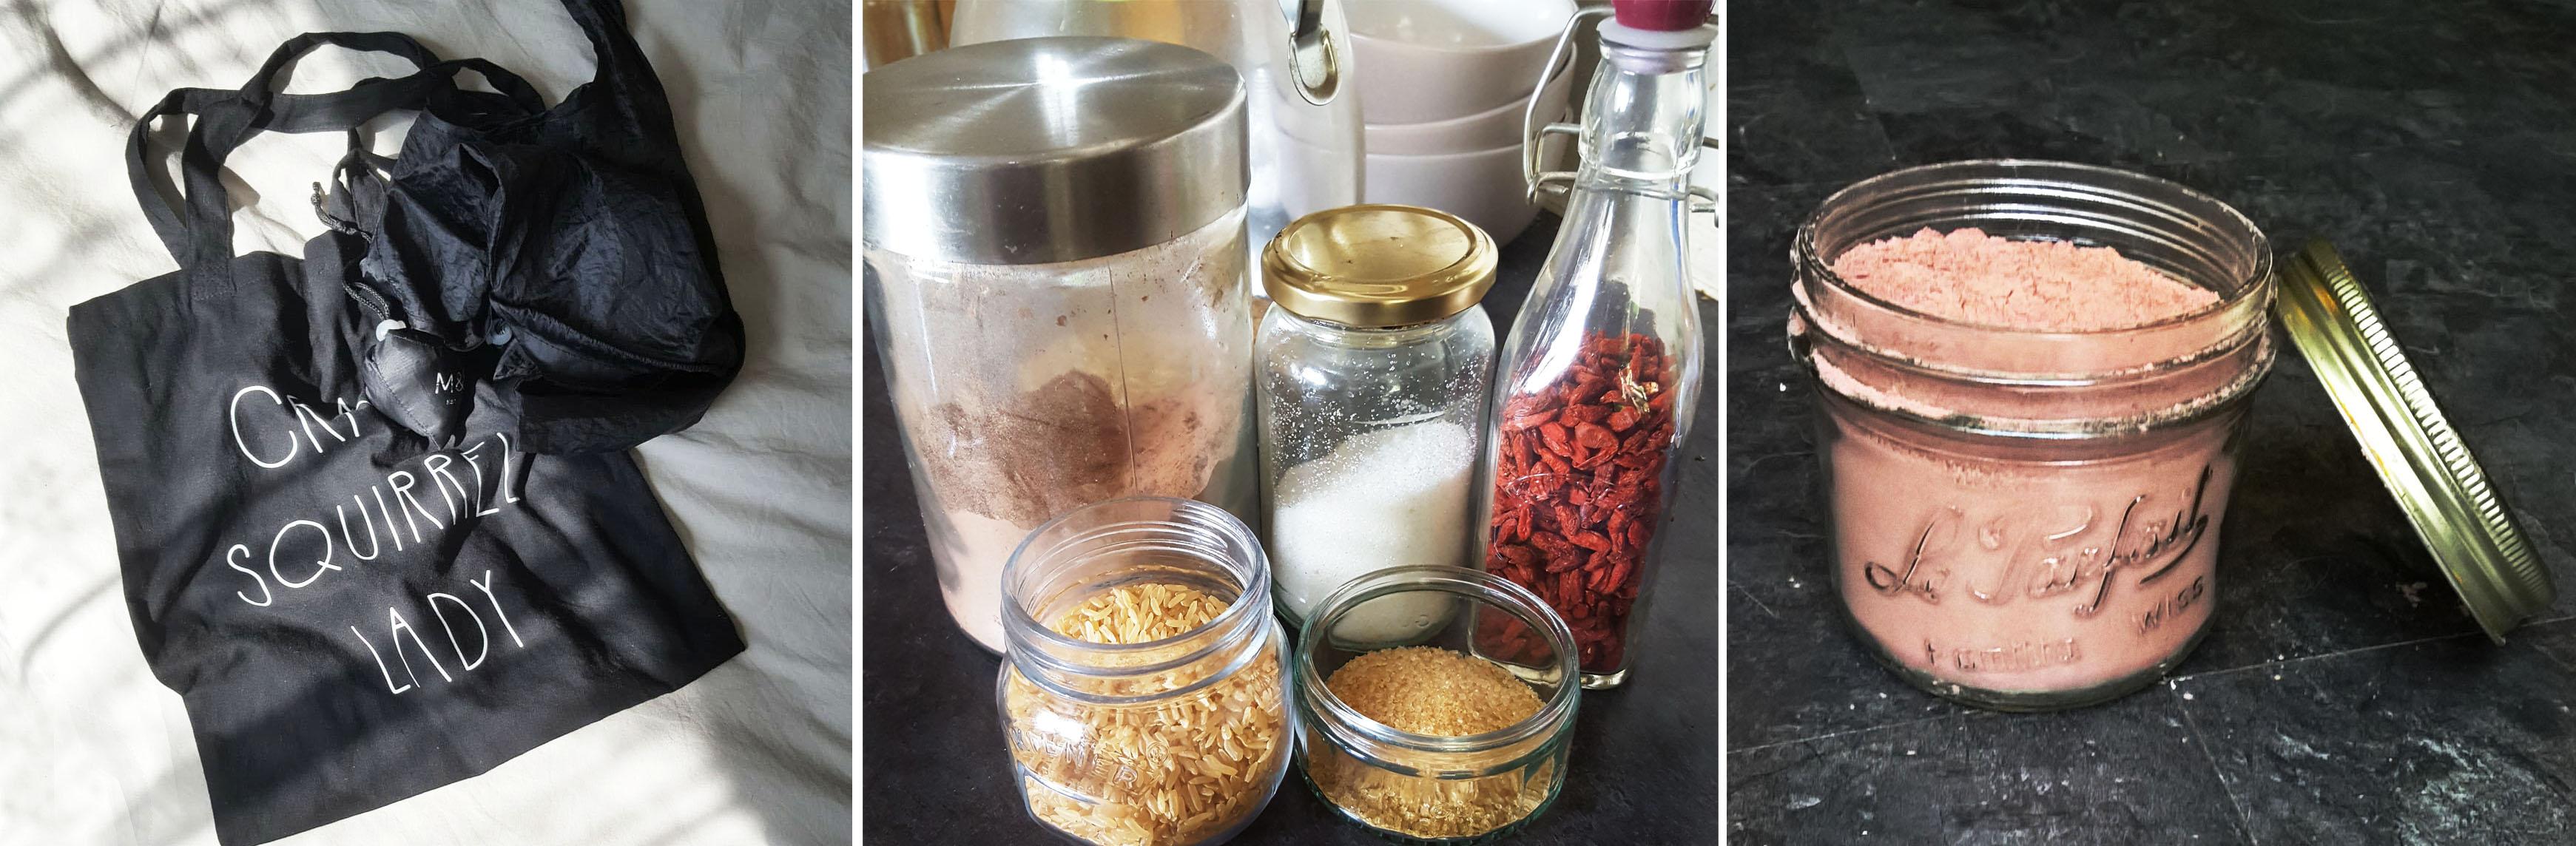 Reusable Shopping Bags - Glass Jars - Hot Choc - the last krystallos